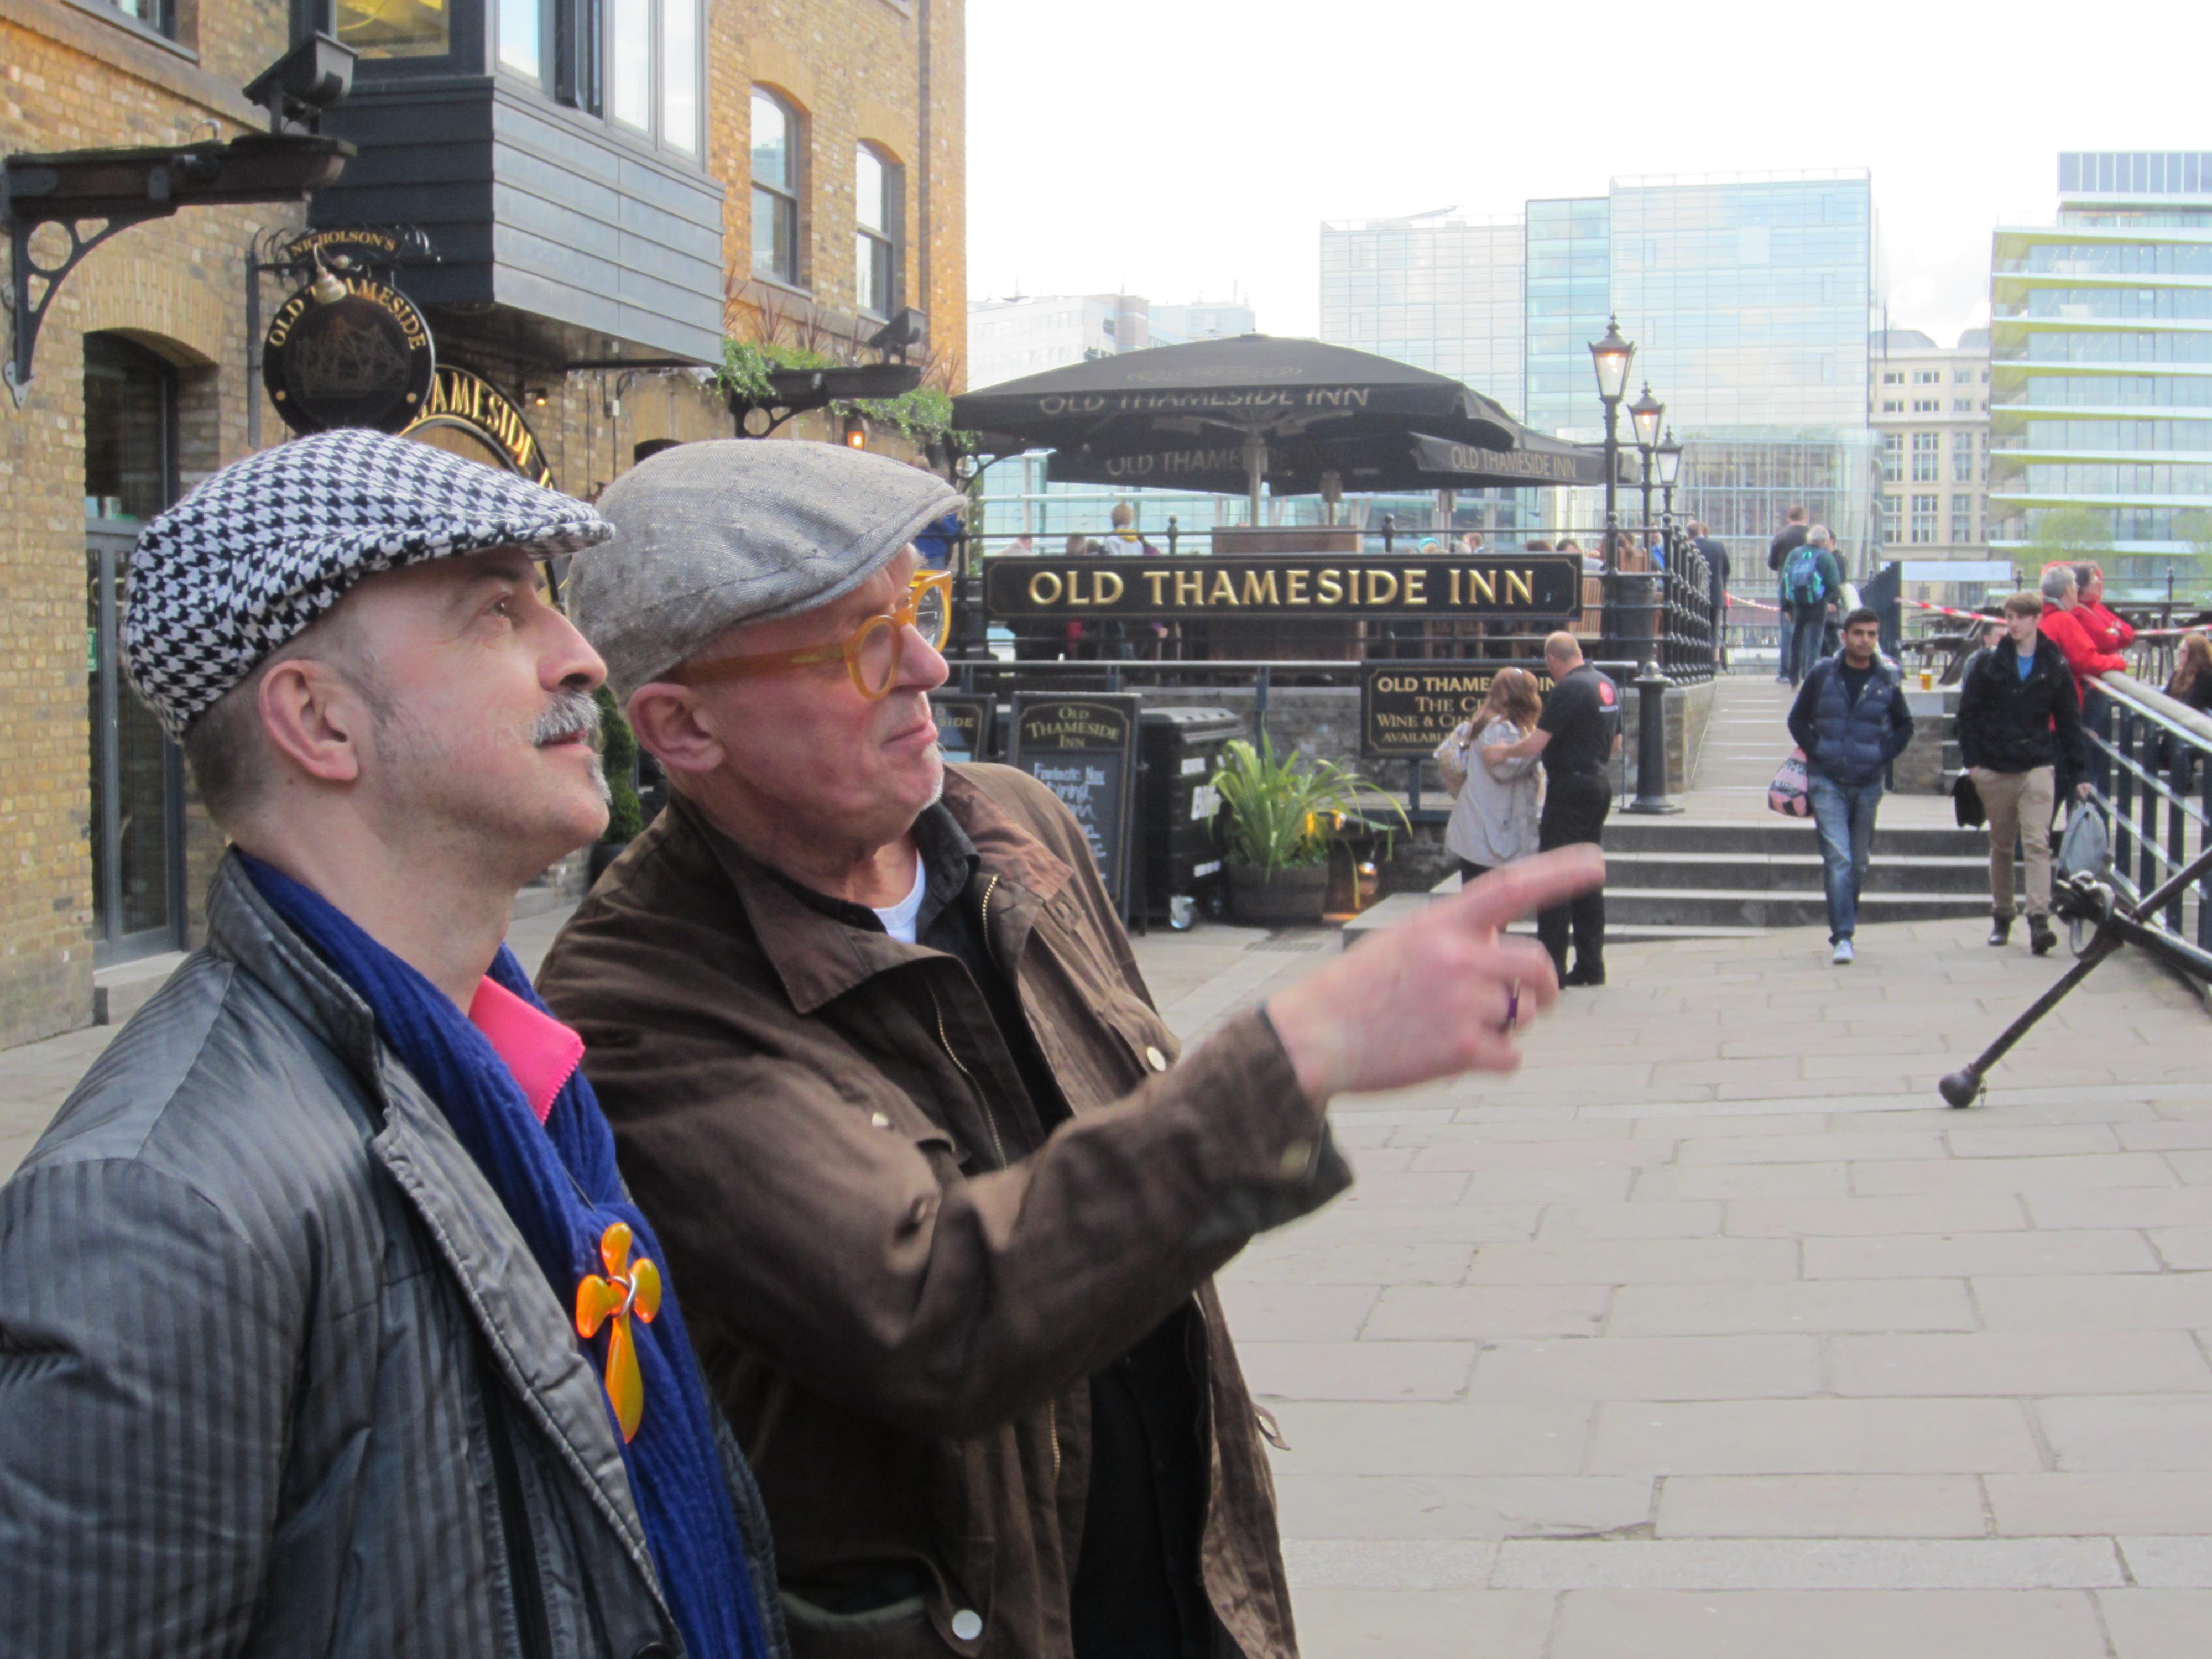 Paul Derrez & Willem Hoogstede, Londen, 2013, portret